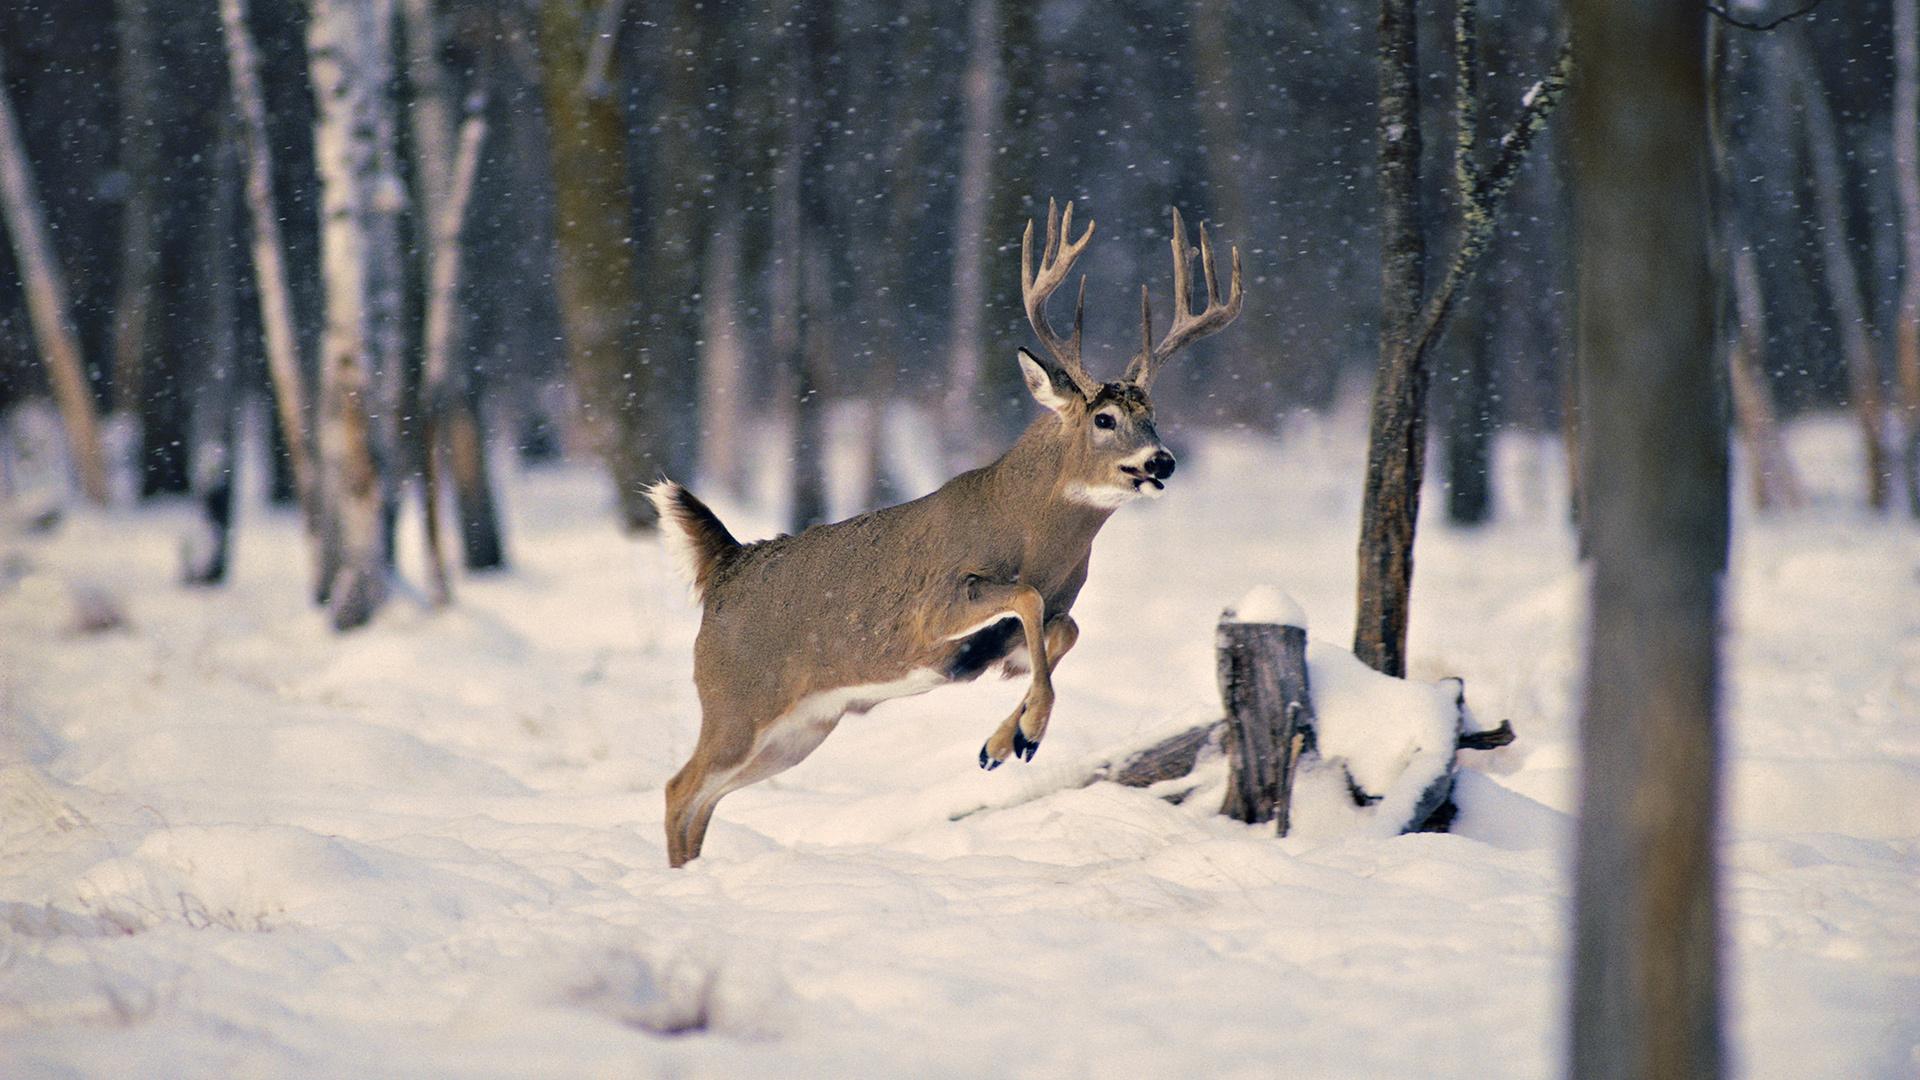 Wallpaper snow wood winter deer horn desktop wallpaper Animals 1920x1080